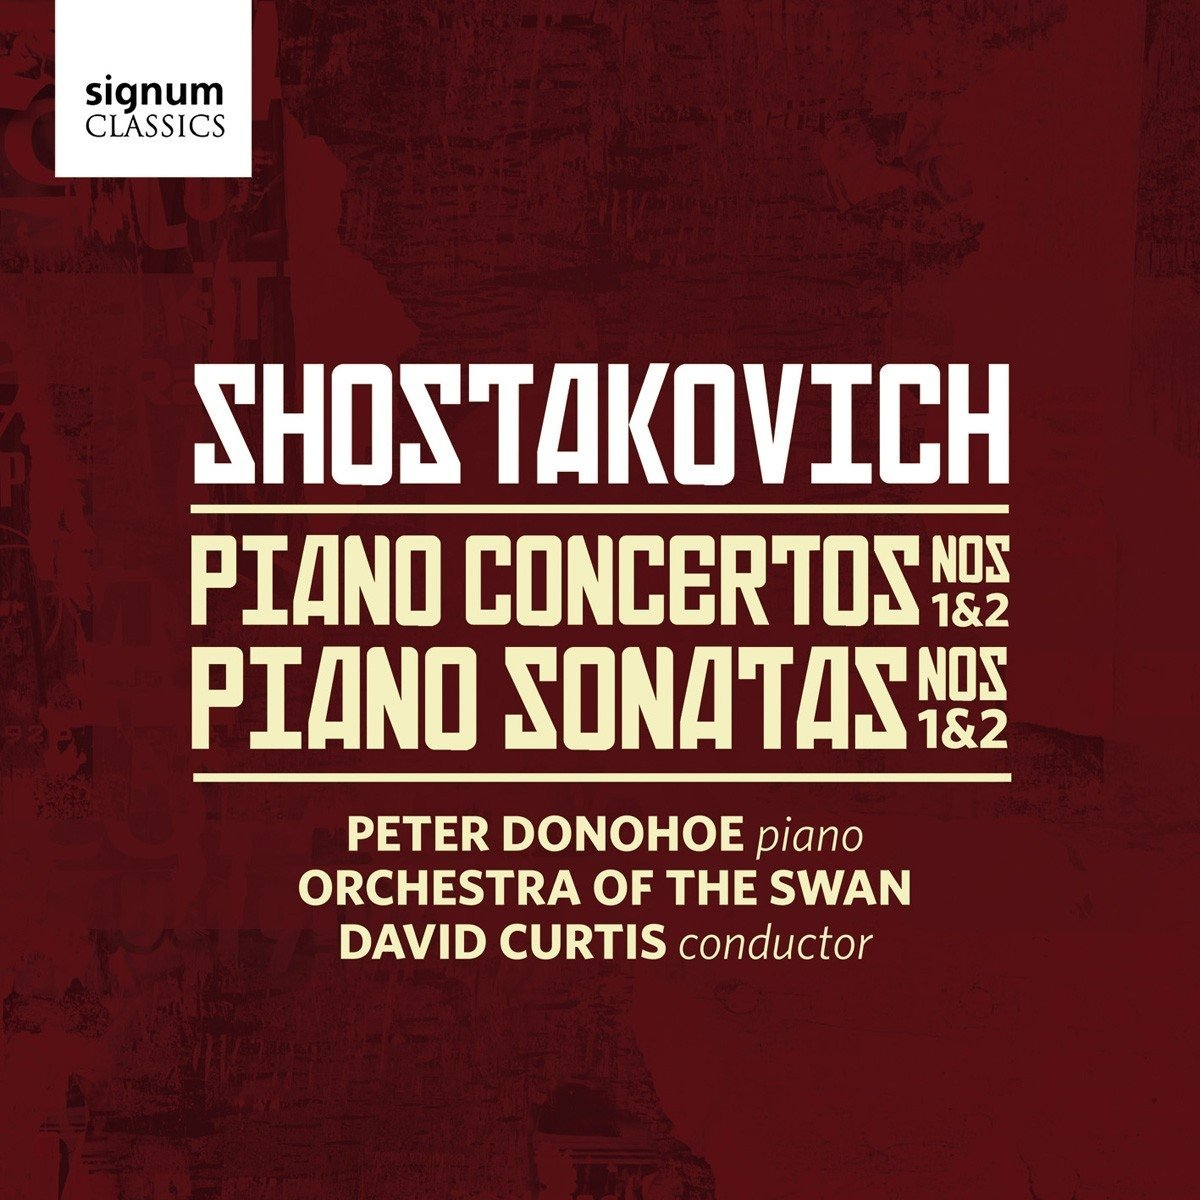 Shostakovich Piano Concertos: Peter Donohoe, Orche